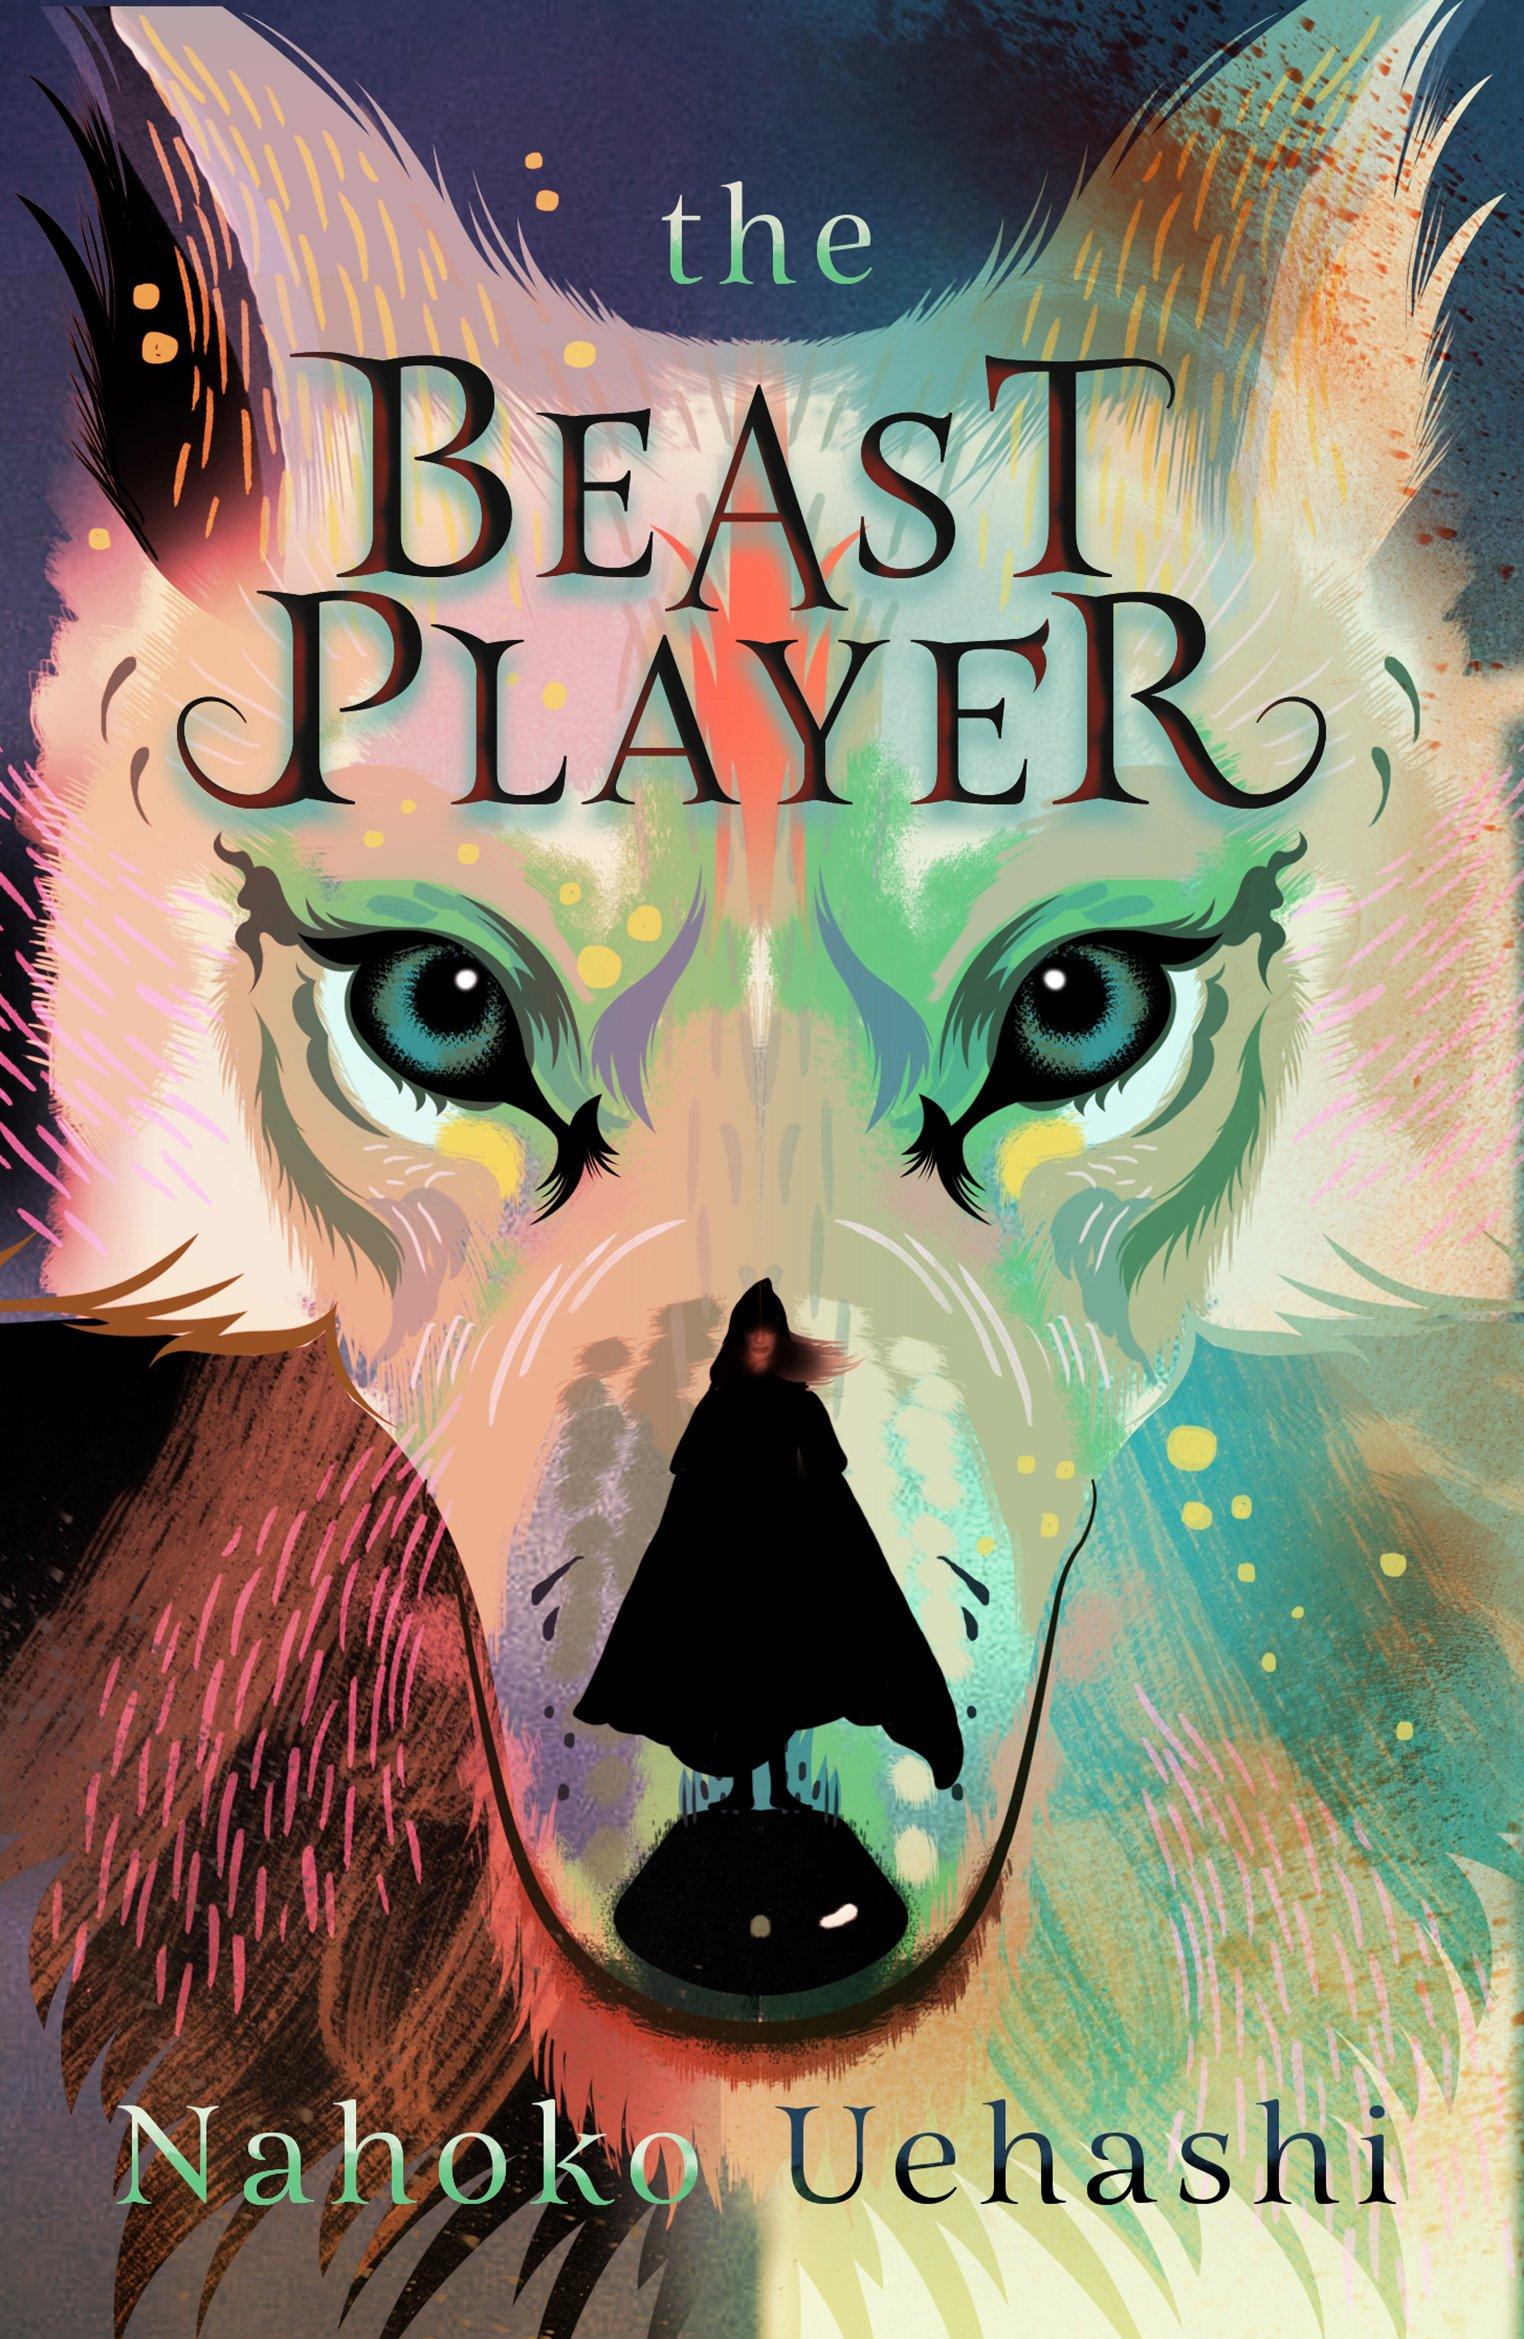 The Beast Player (The International Bestseller): Amazon.co.uk: Nahoko  Uehashi: 9781782691679: Books